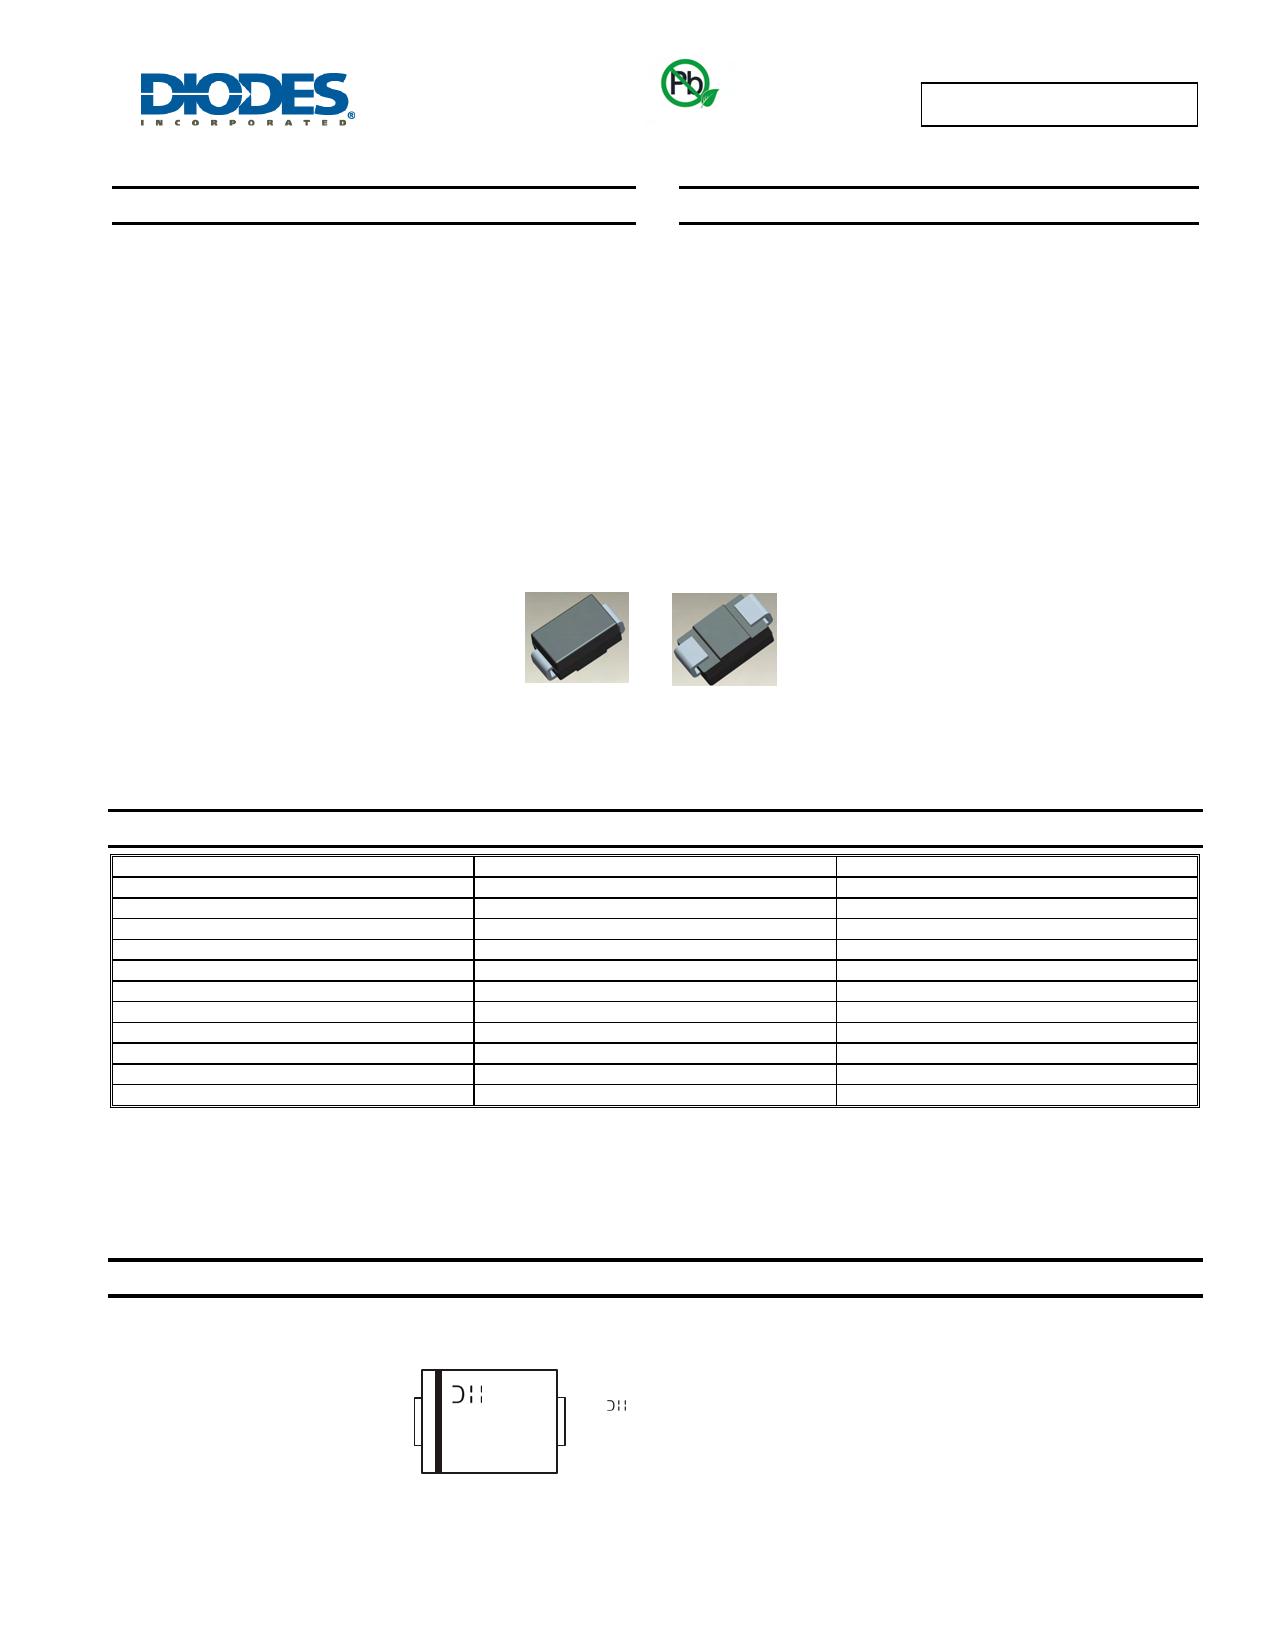 TB1500M datasheet